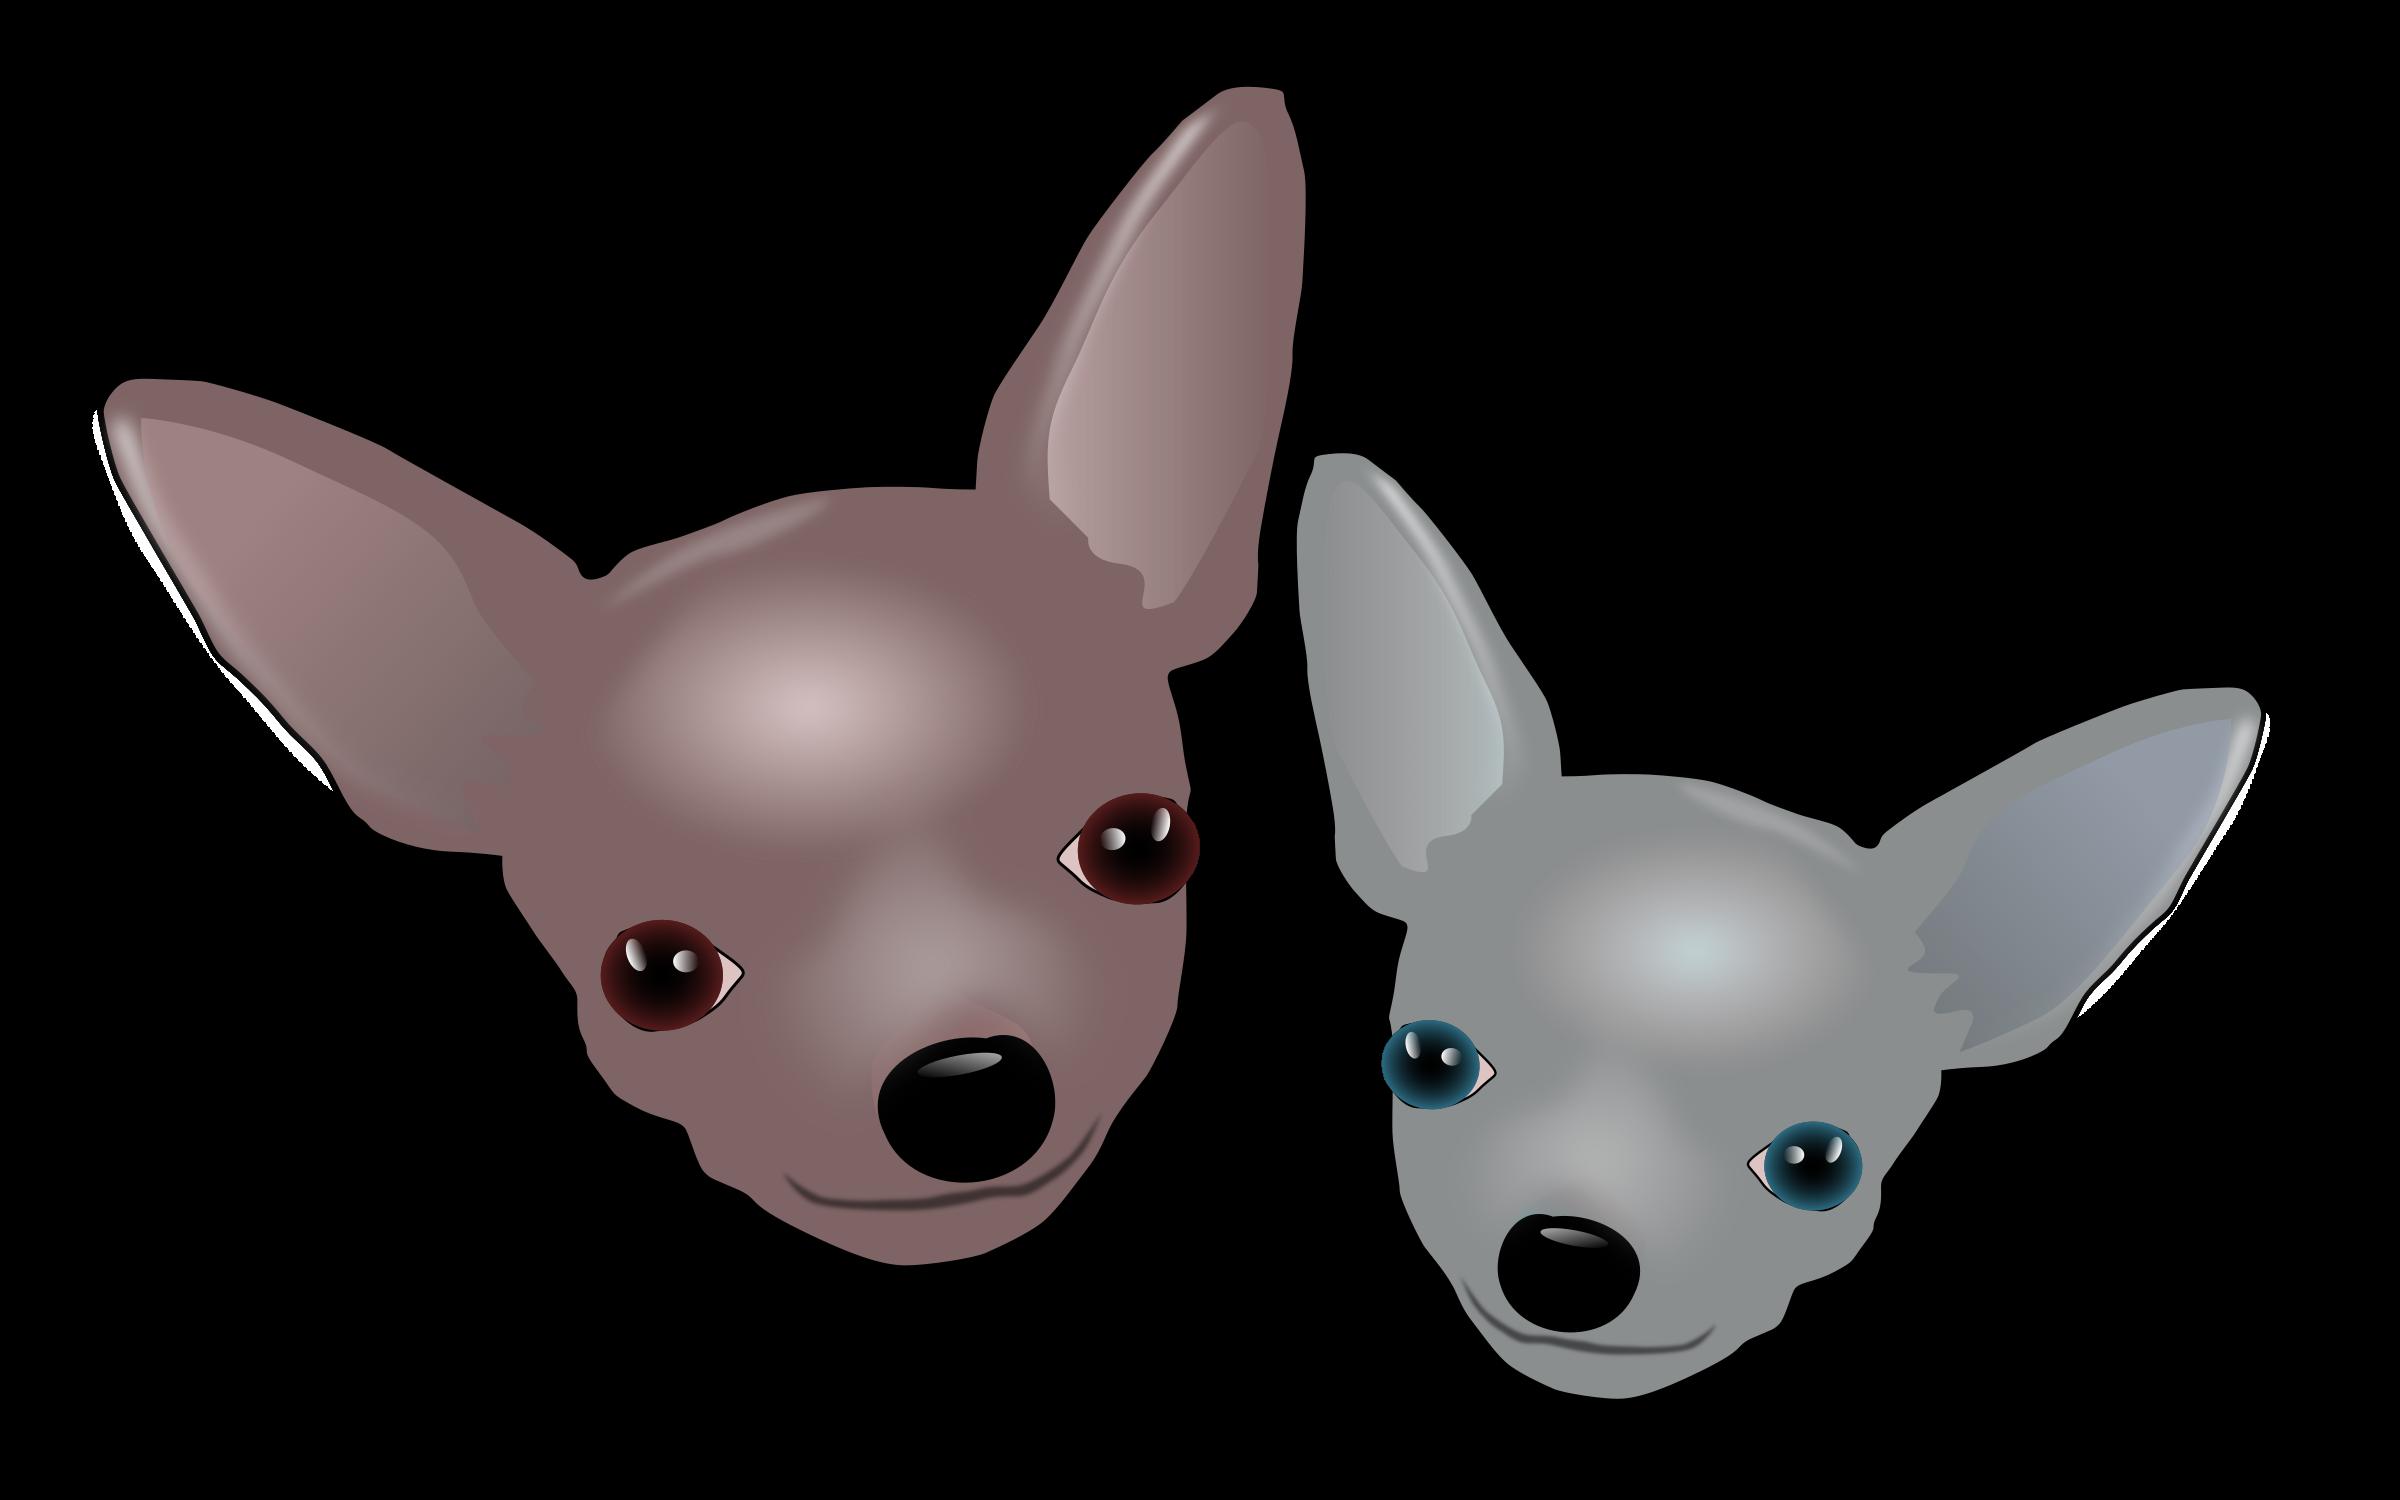 Chihuahua dog clipart clipart Clipart - Two Chihuahuas clipart